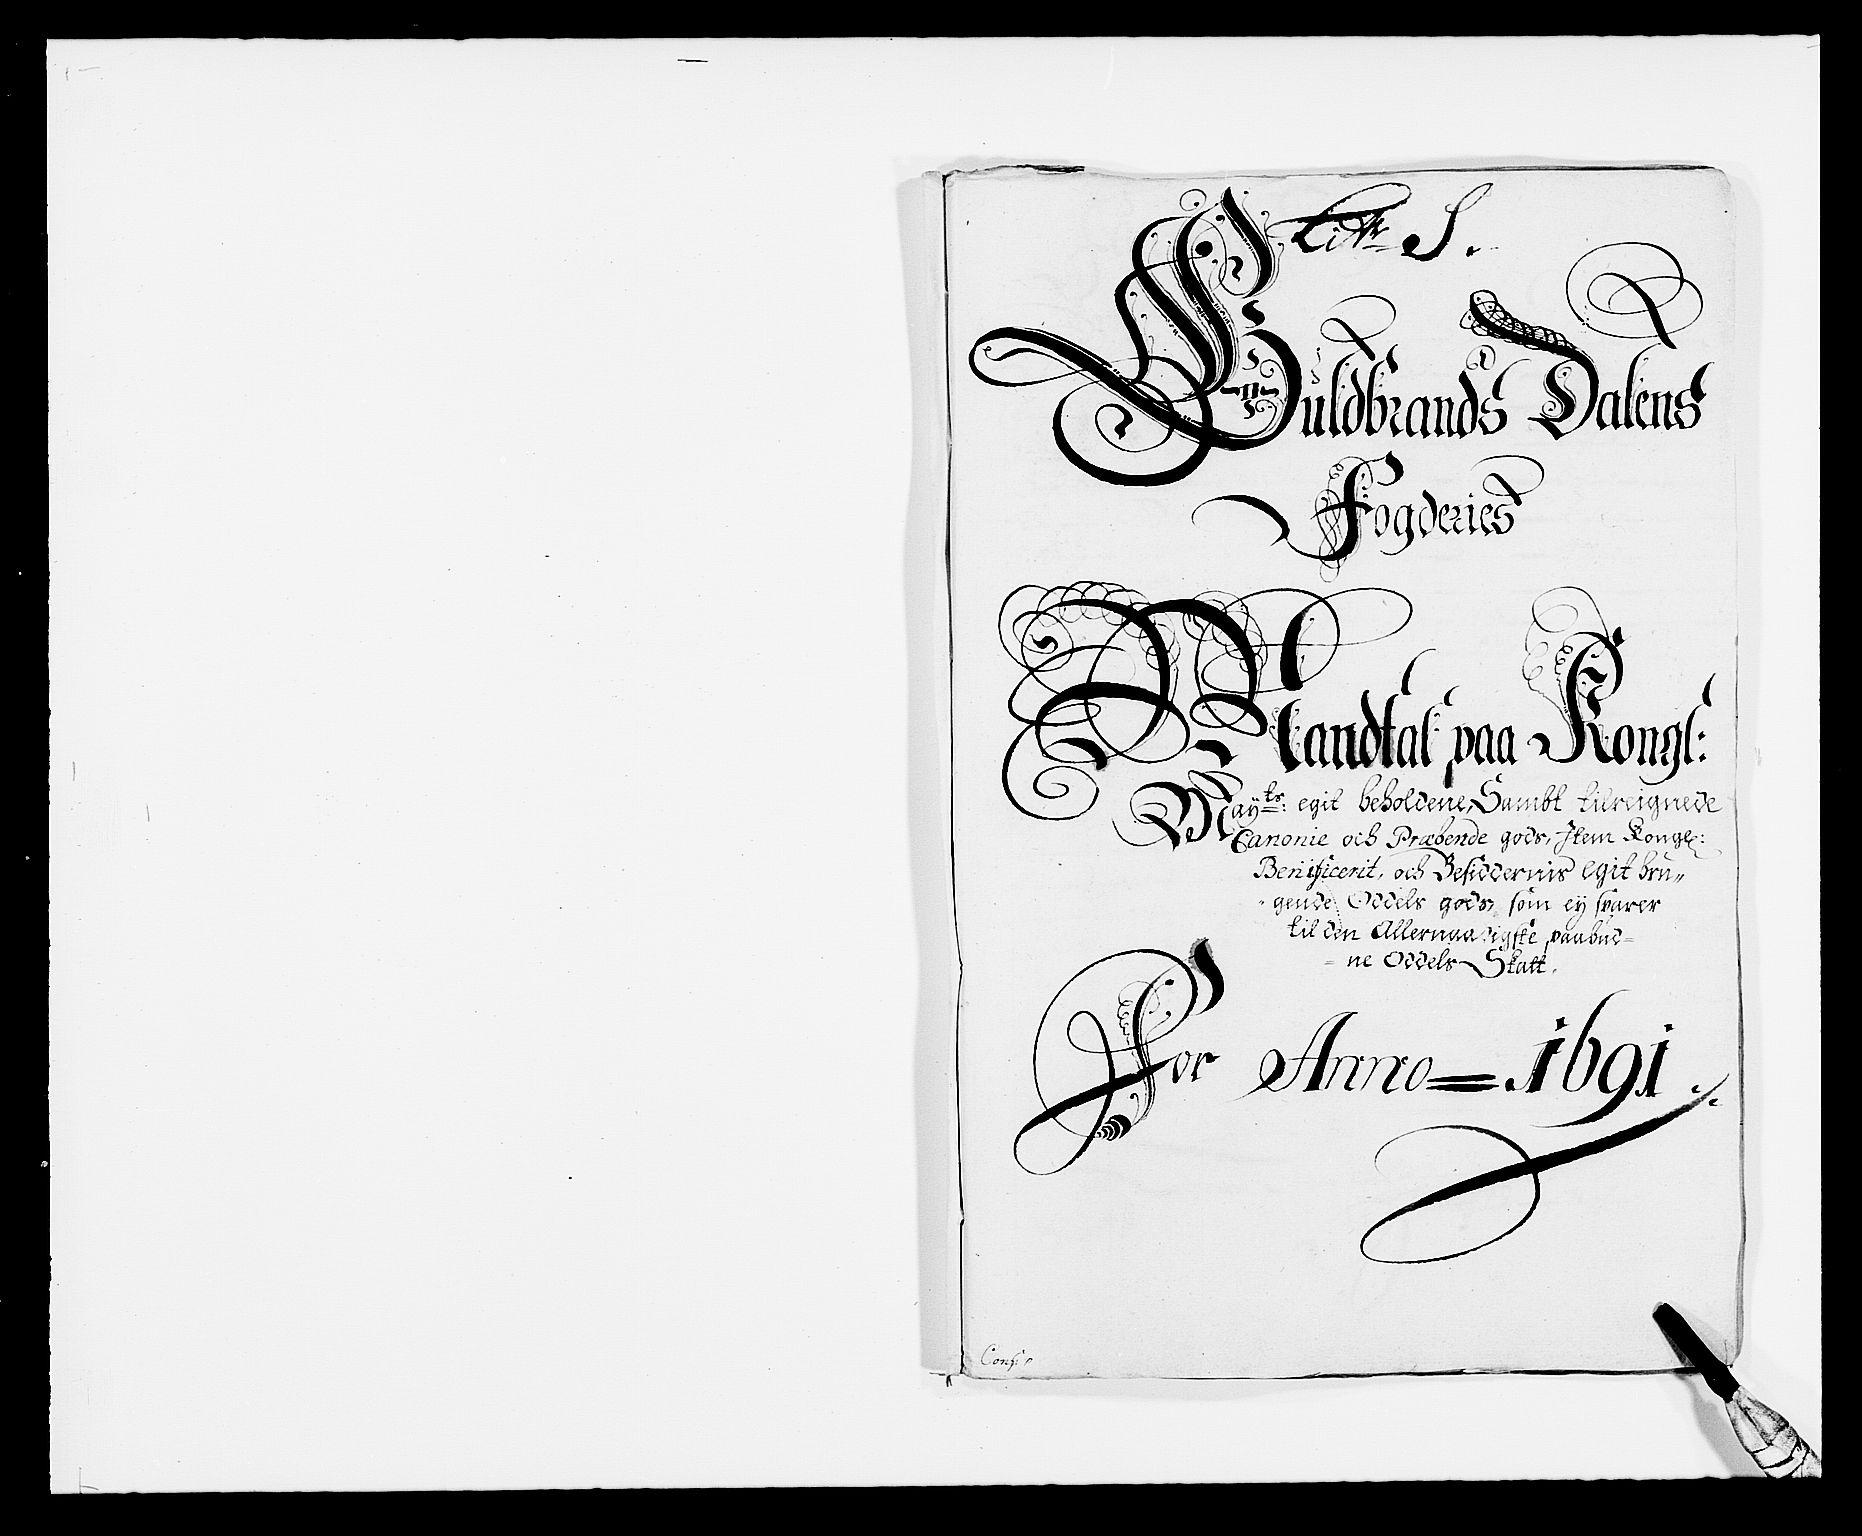 RA, Rentekammeret inntil 1814, Reviderte regnskaper, Fogderegnskap, R17/L1165: Fogderegnskap Gudbrandsdal, 1690-1692, s. 295